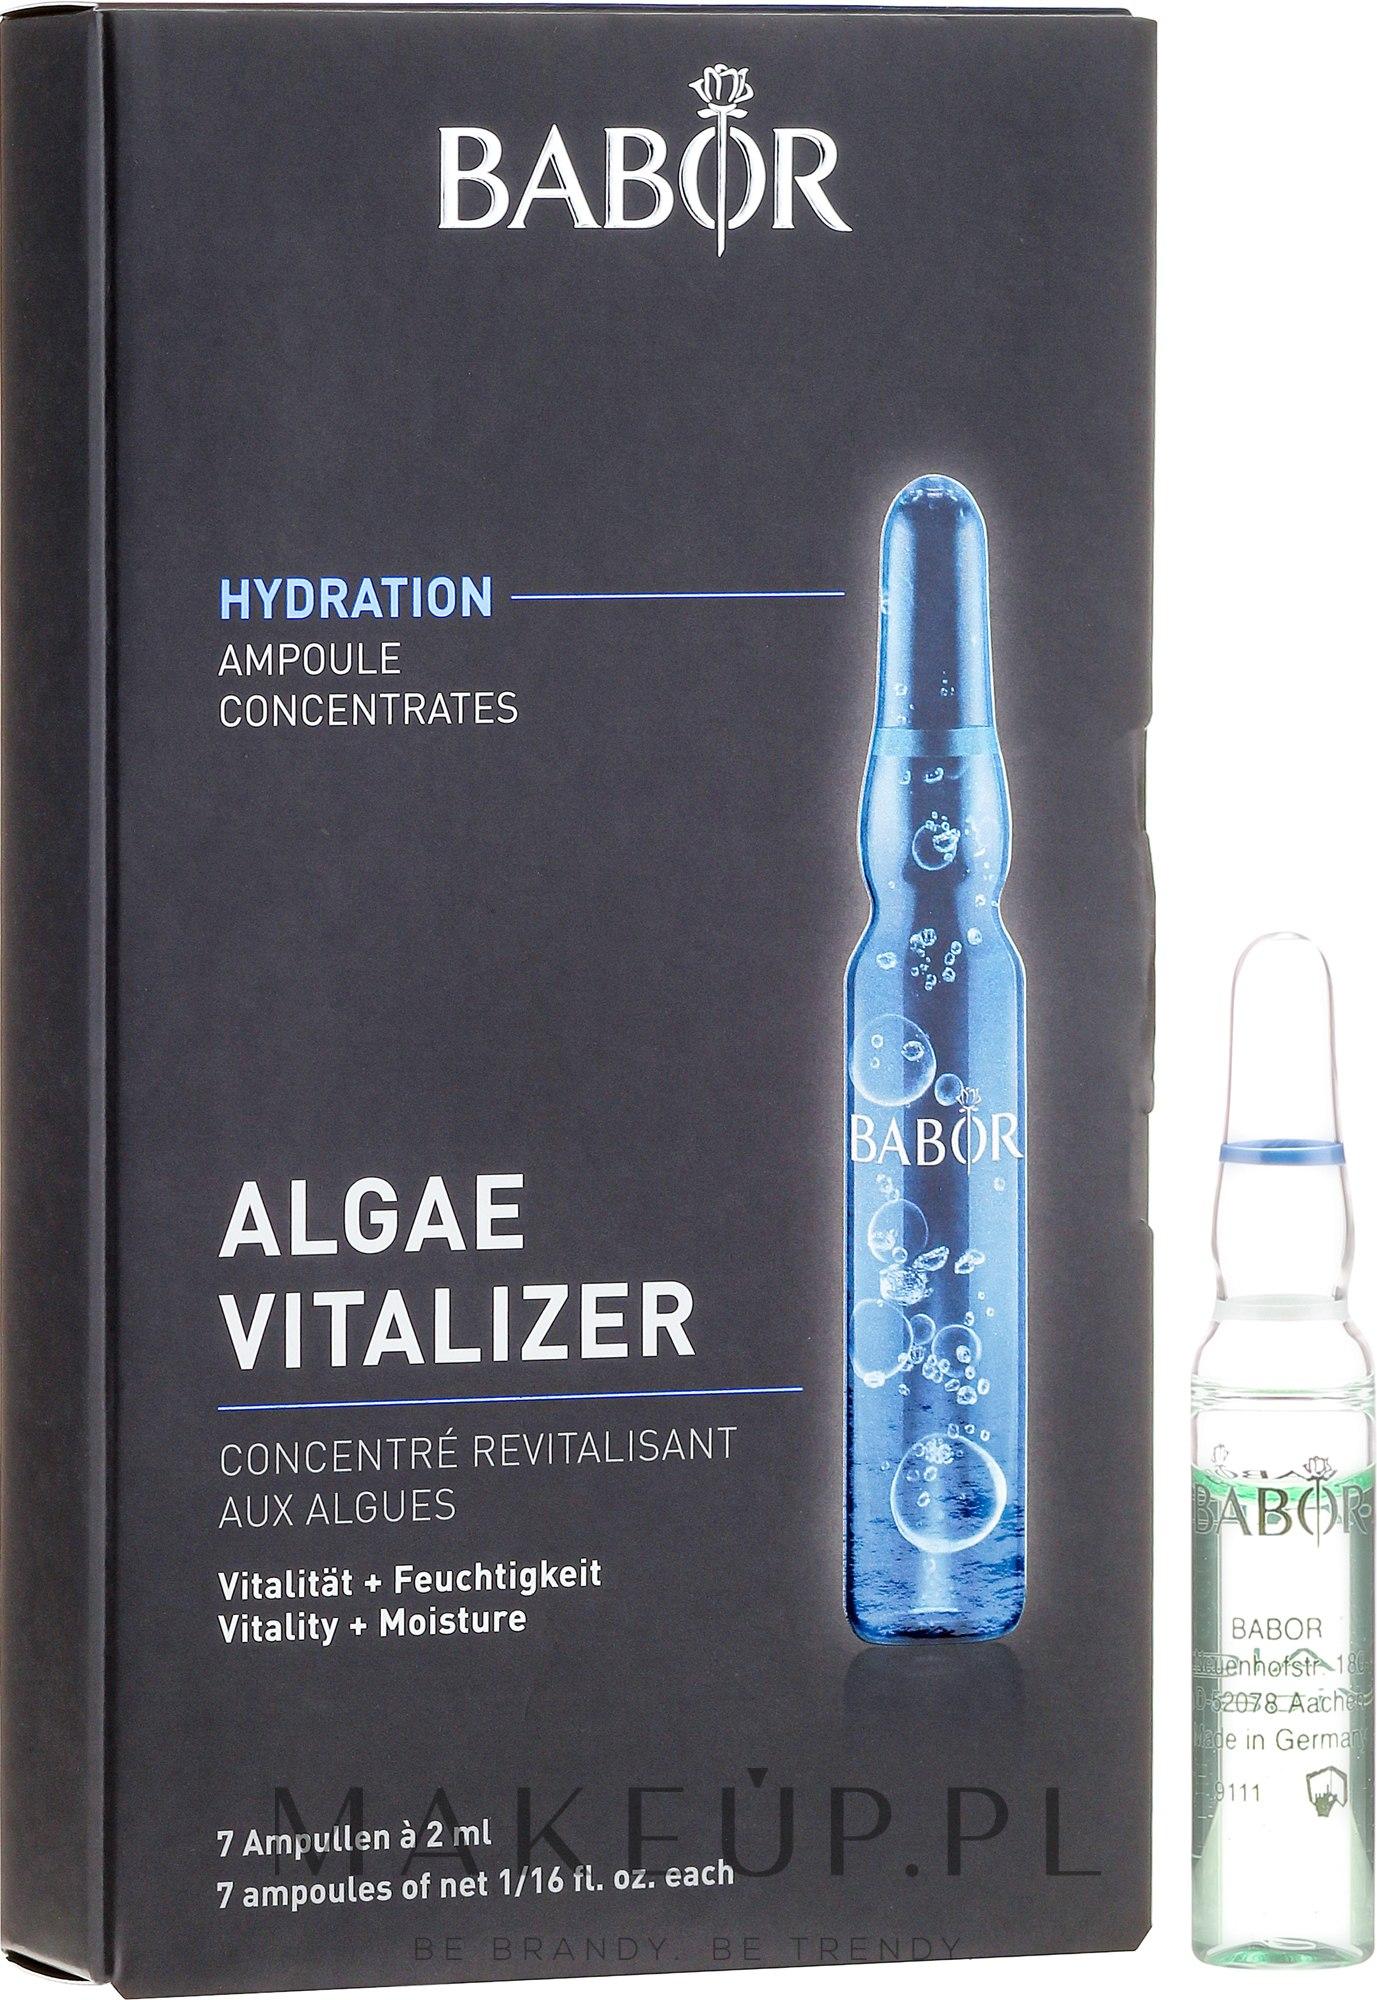 Ampułki do twarzy z algami - Babor Ampoule Concentrates Algae Vitalizer — фото 7 x 2 ml